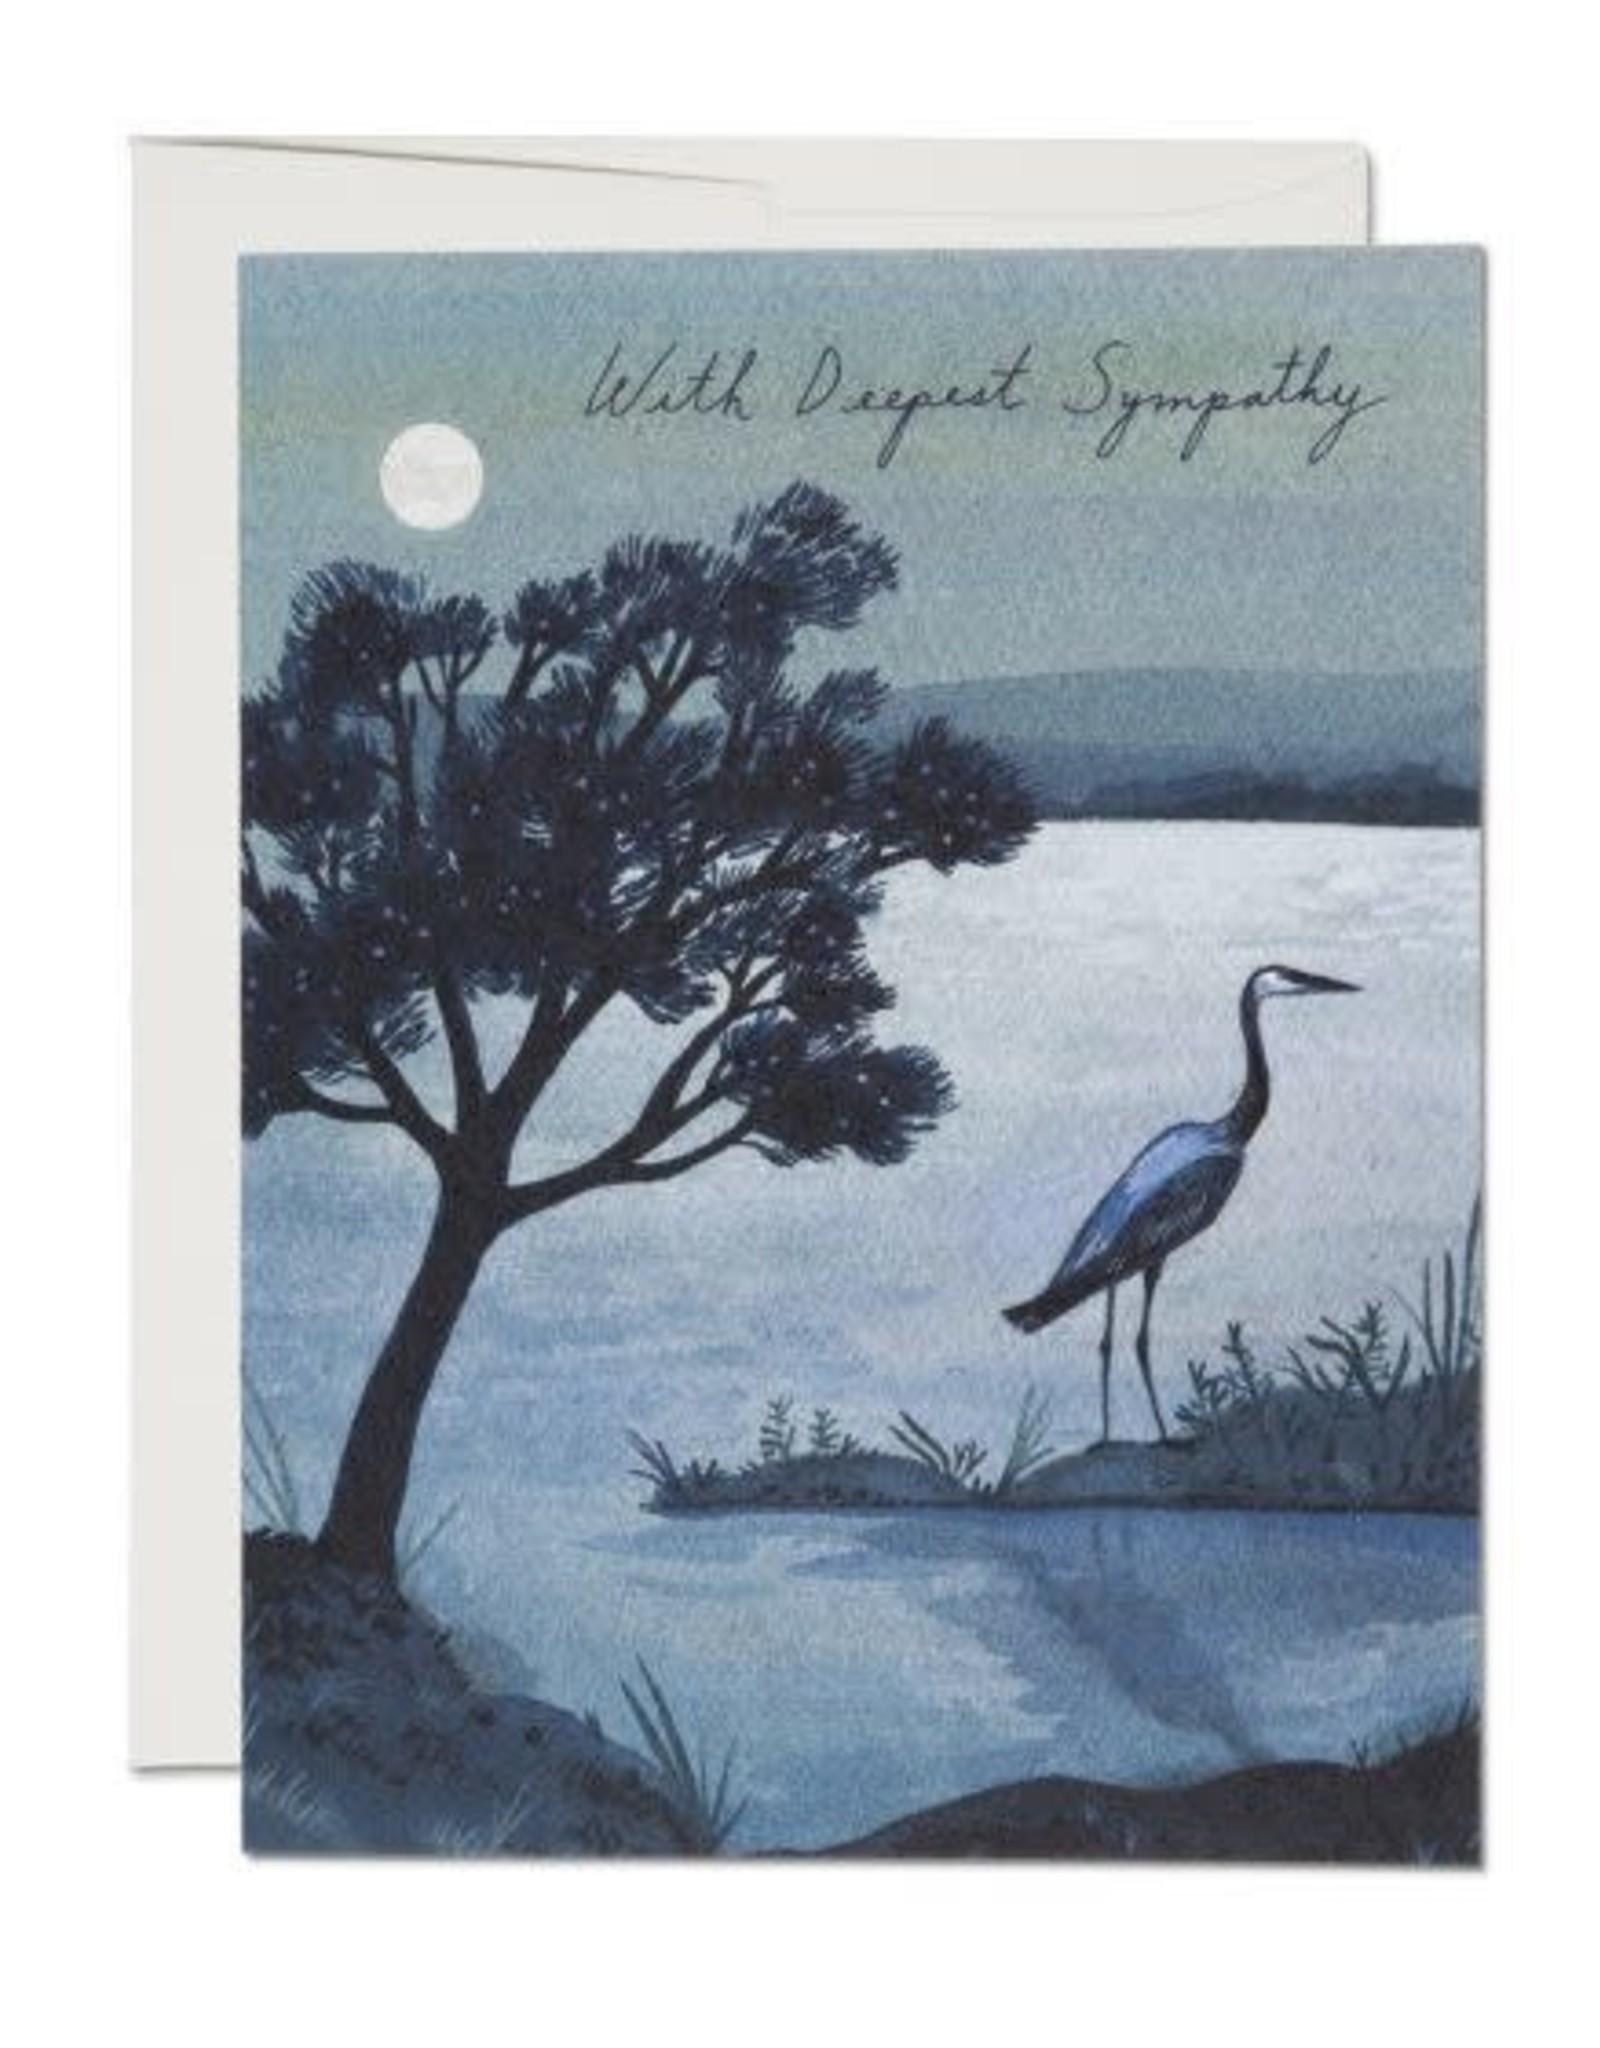 Blue Heron With Sympathy Greeting Card